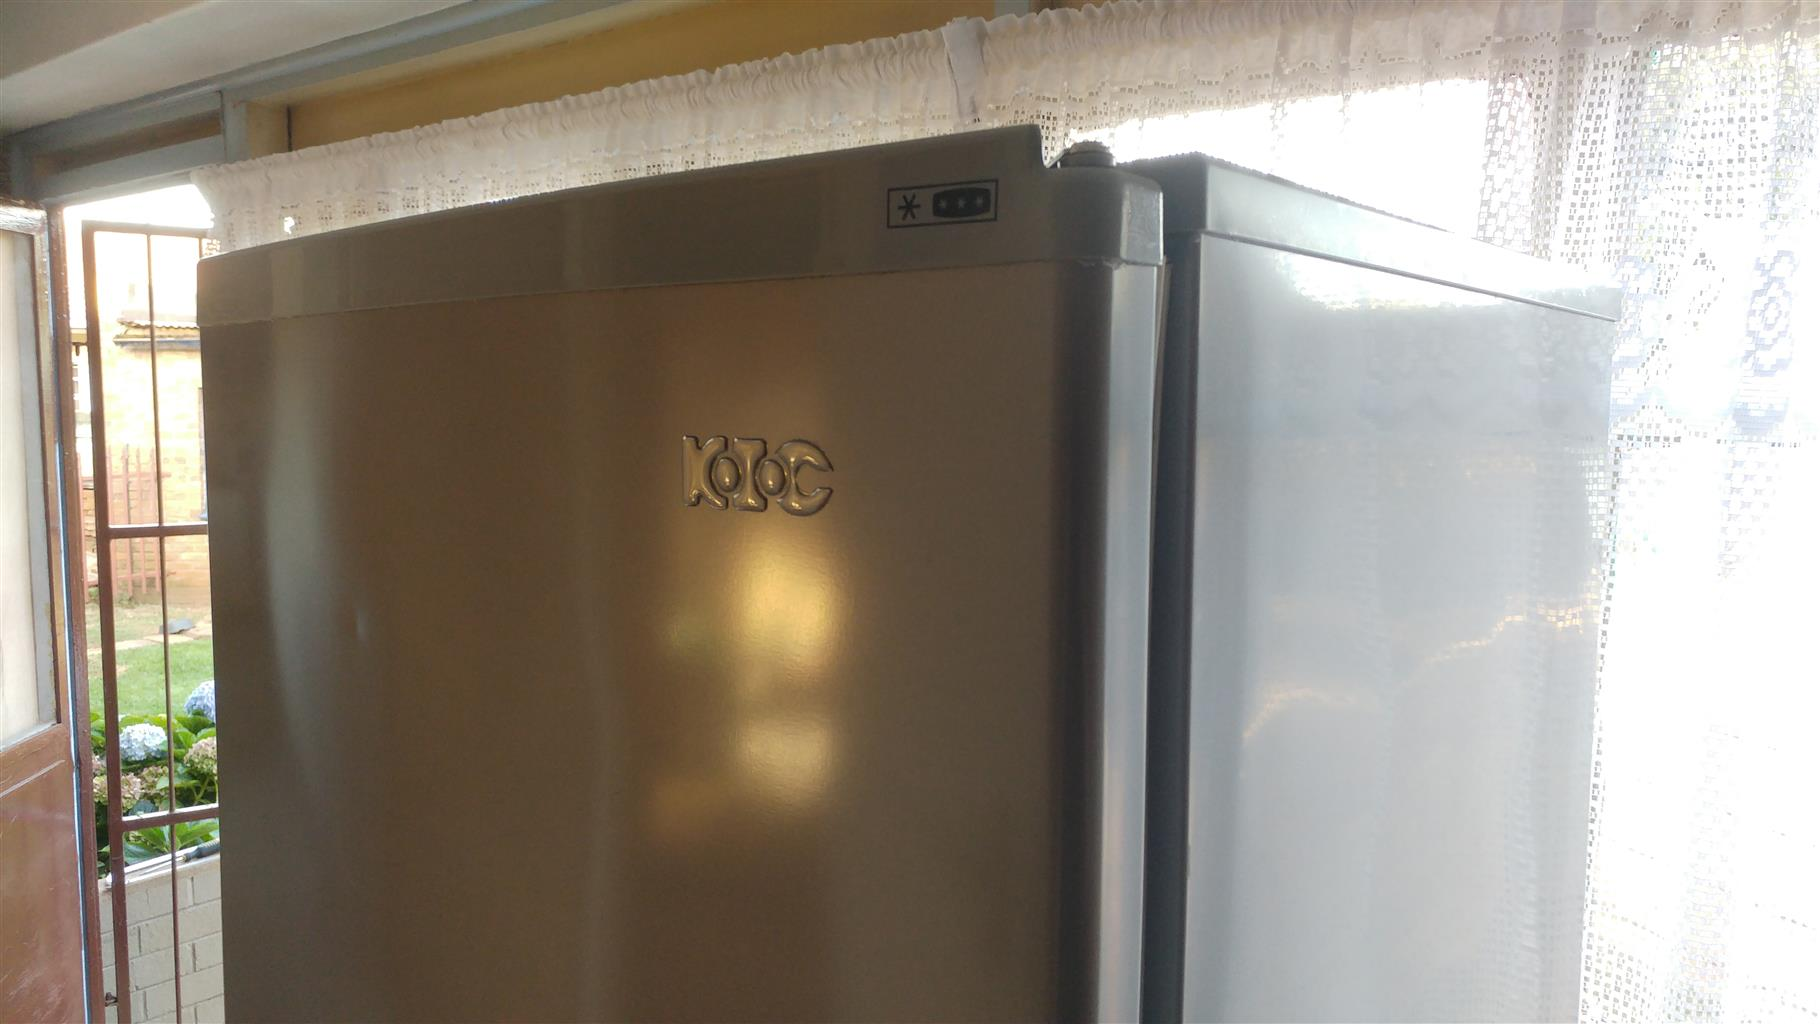 KIC fridge / freezer